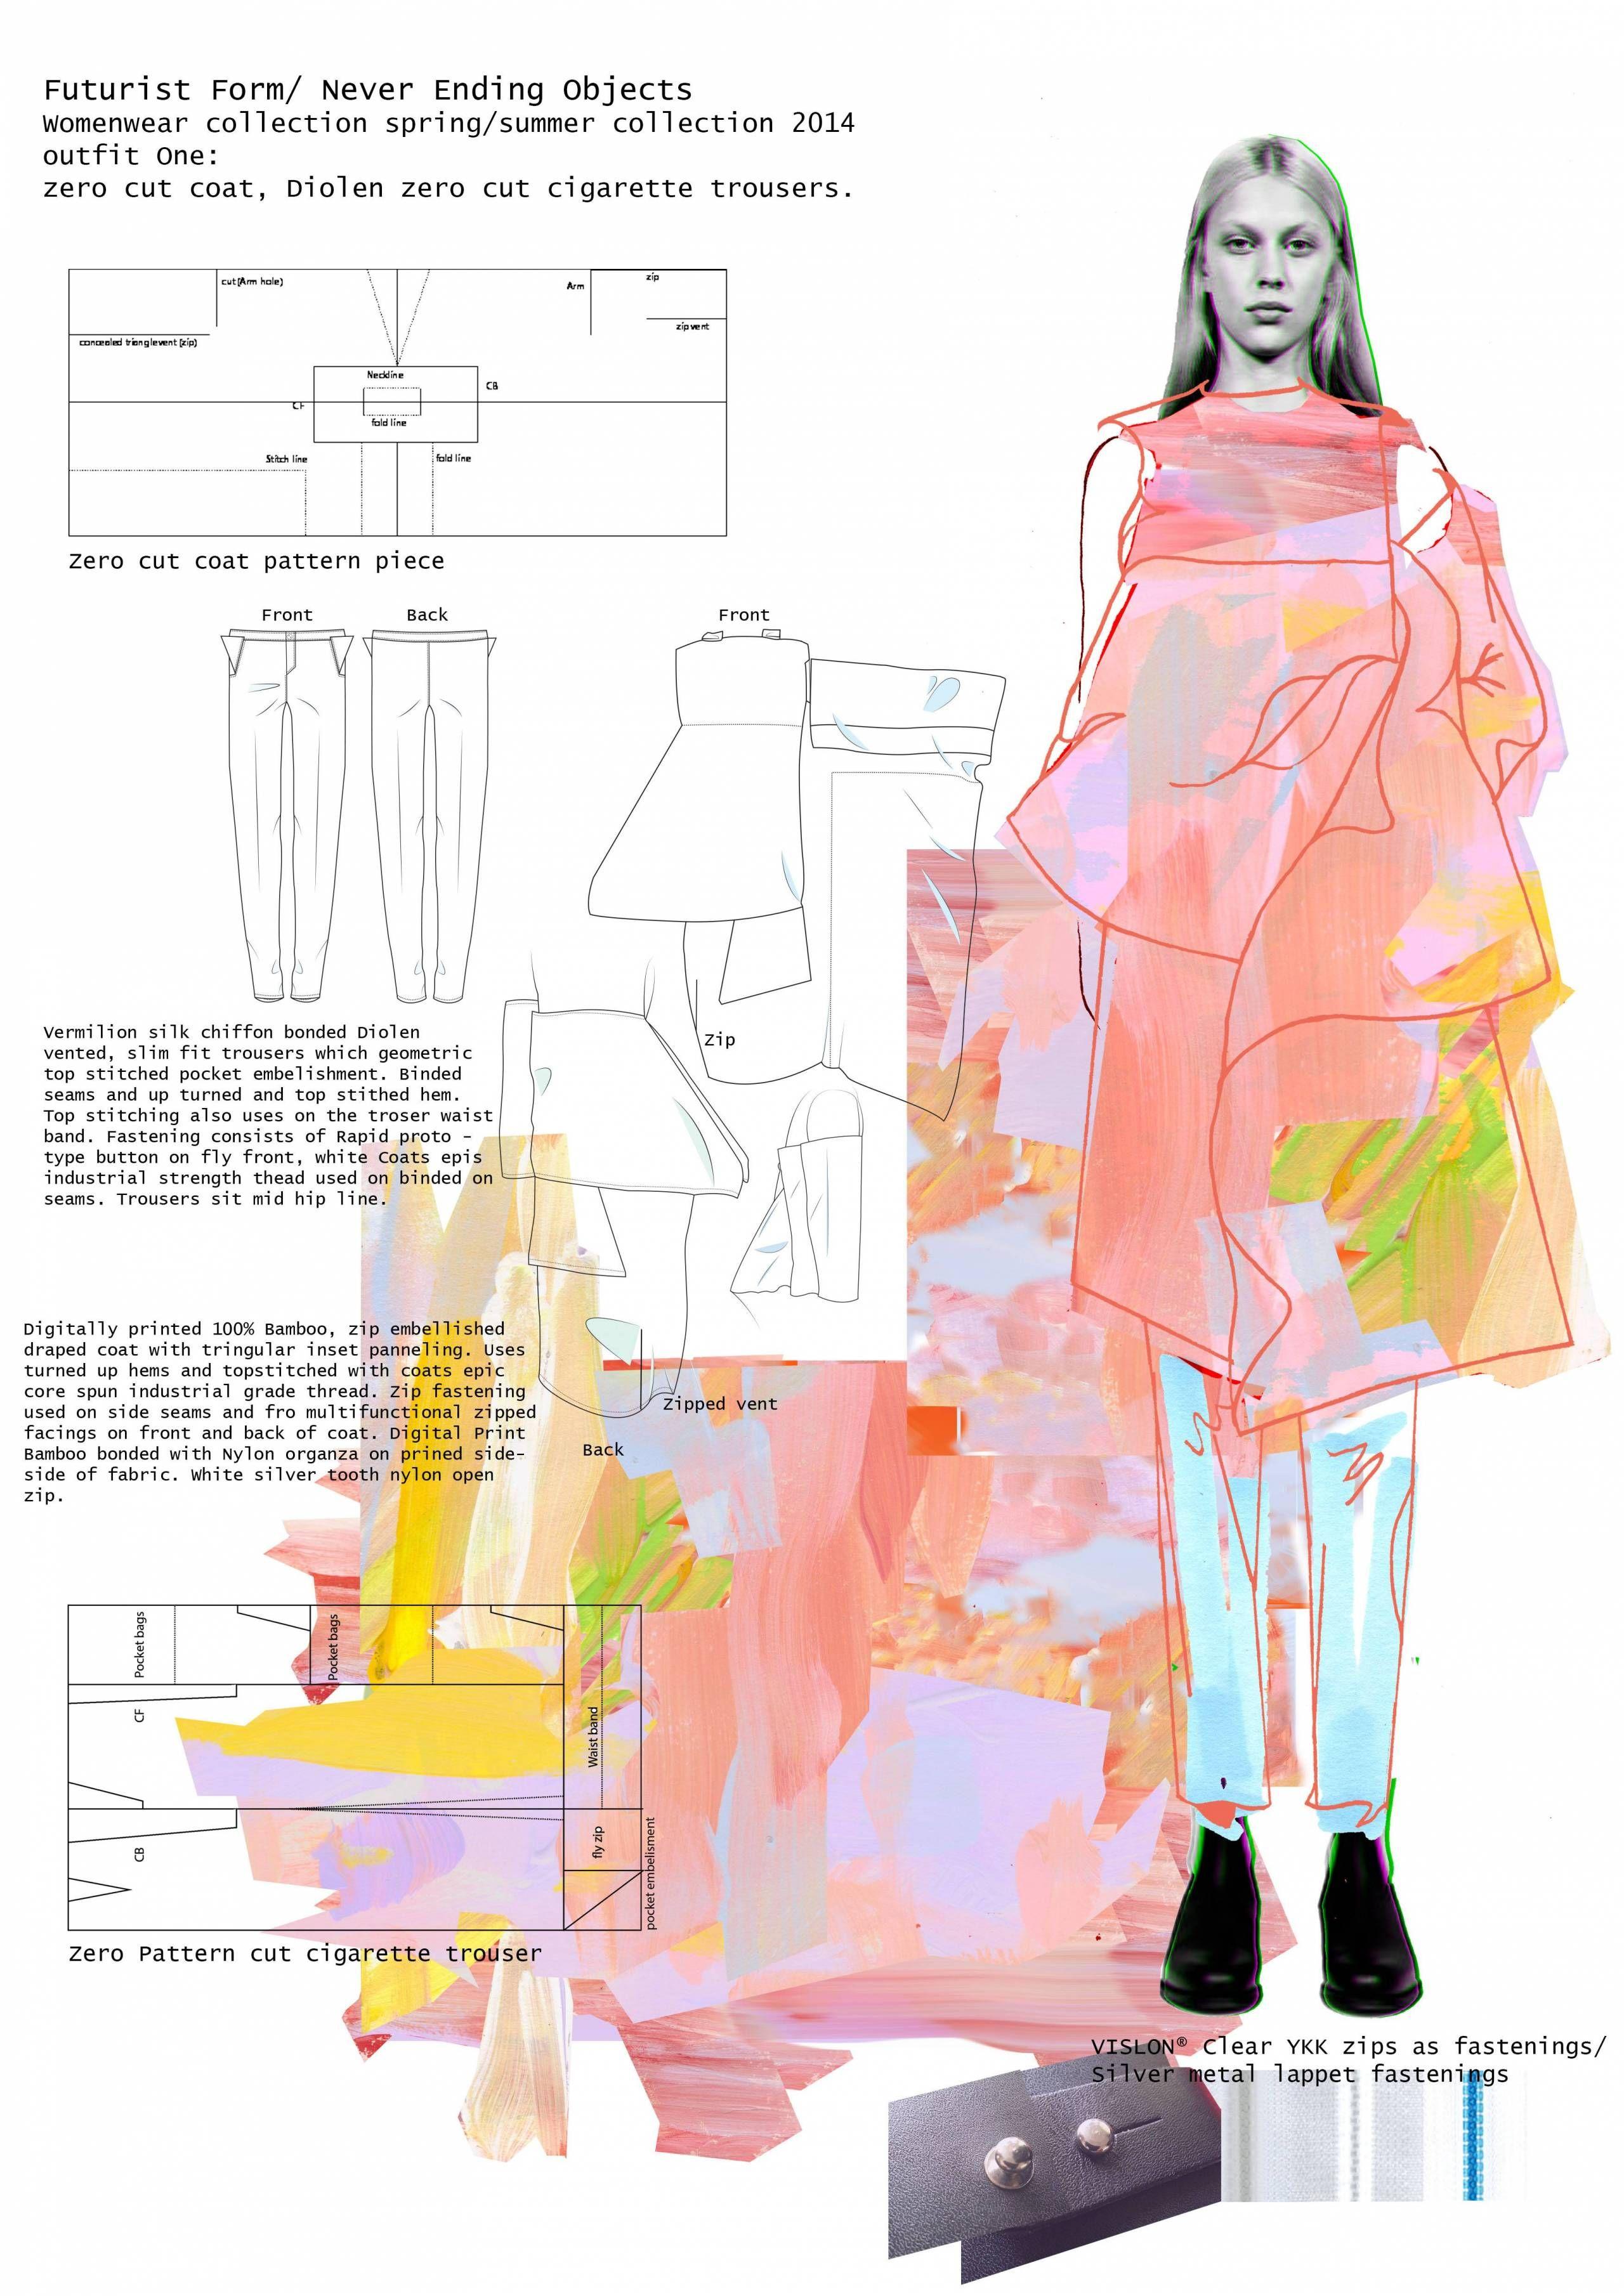 ARTS THREAD Portfolios - Fashion Illustration and Design